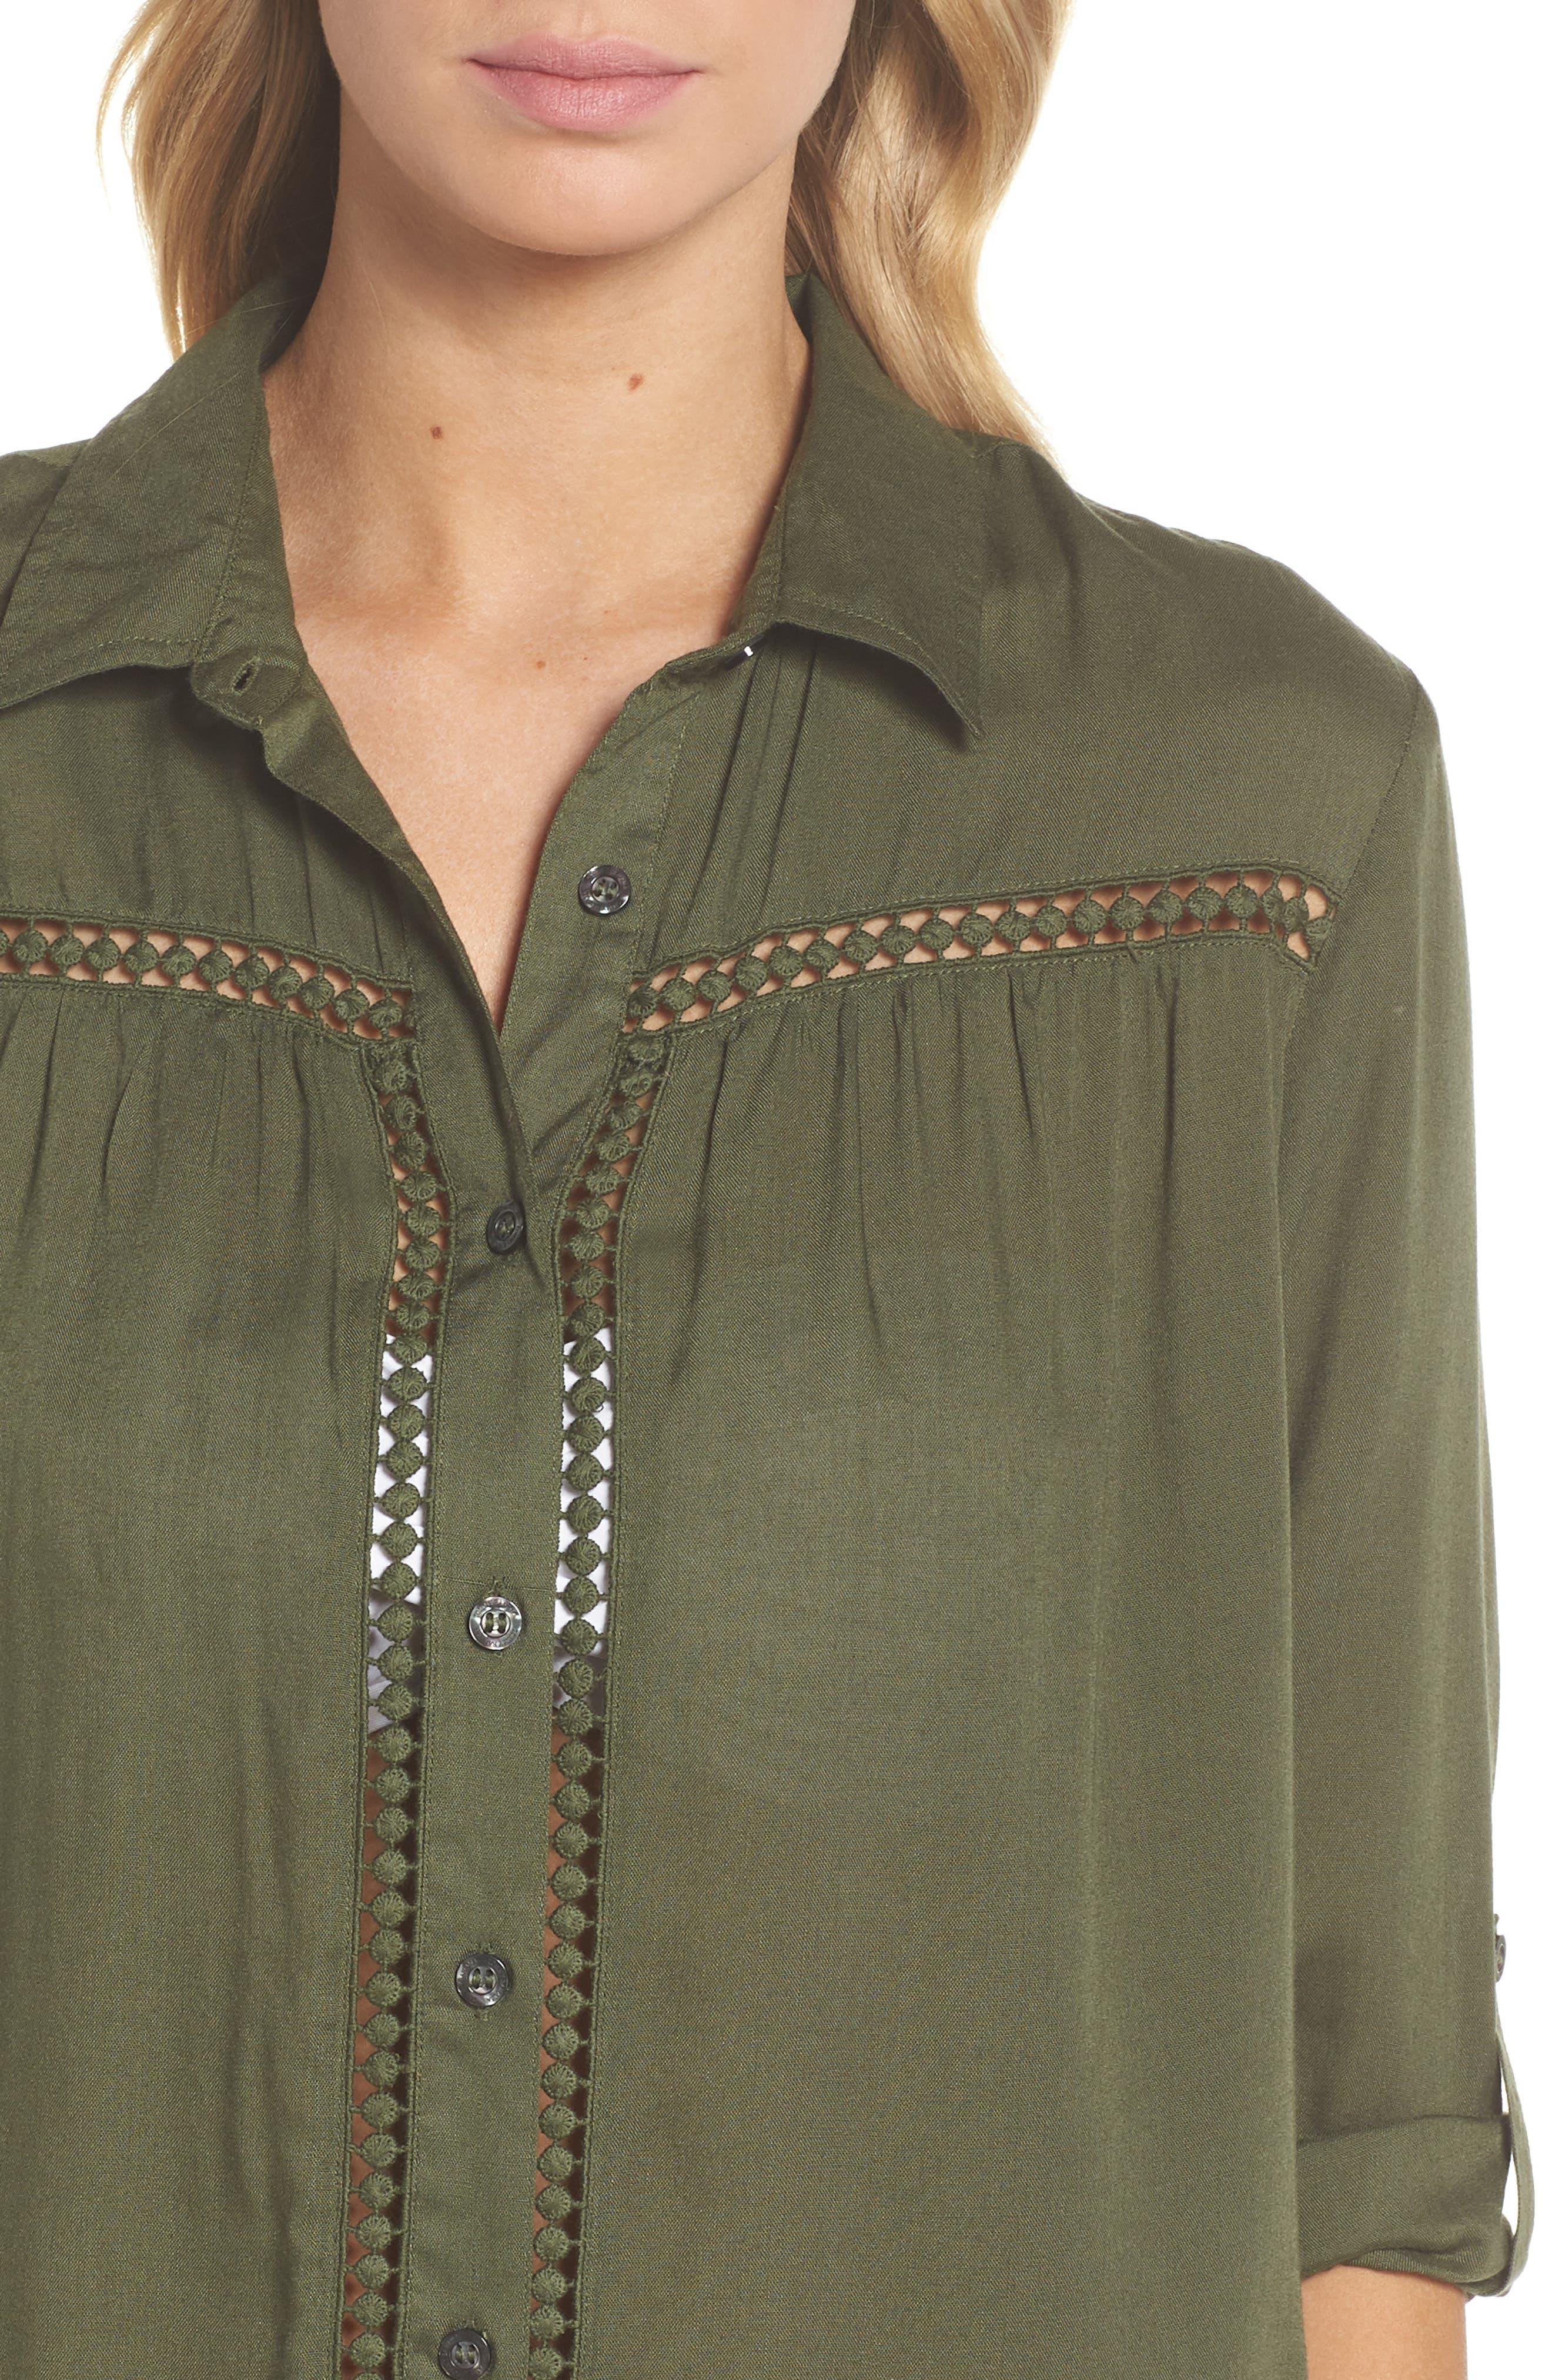 TOMMY BAHAMA,                             Crochet Boyfriend Shirt Cover-Up,                             Alternate thumbnail 4, color,                             DARK TEA LEAF